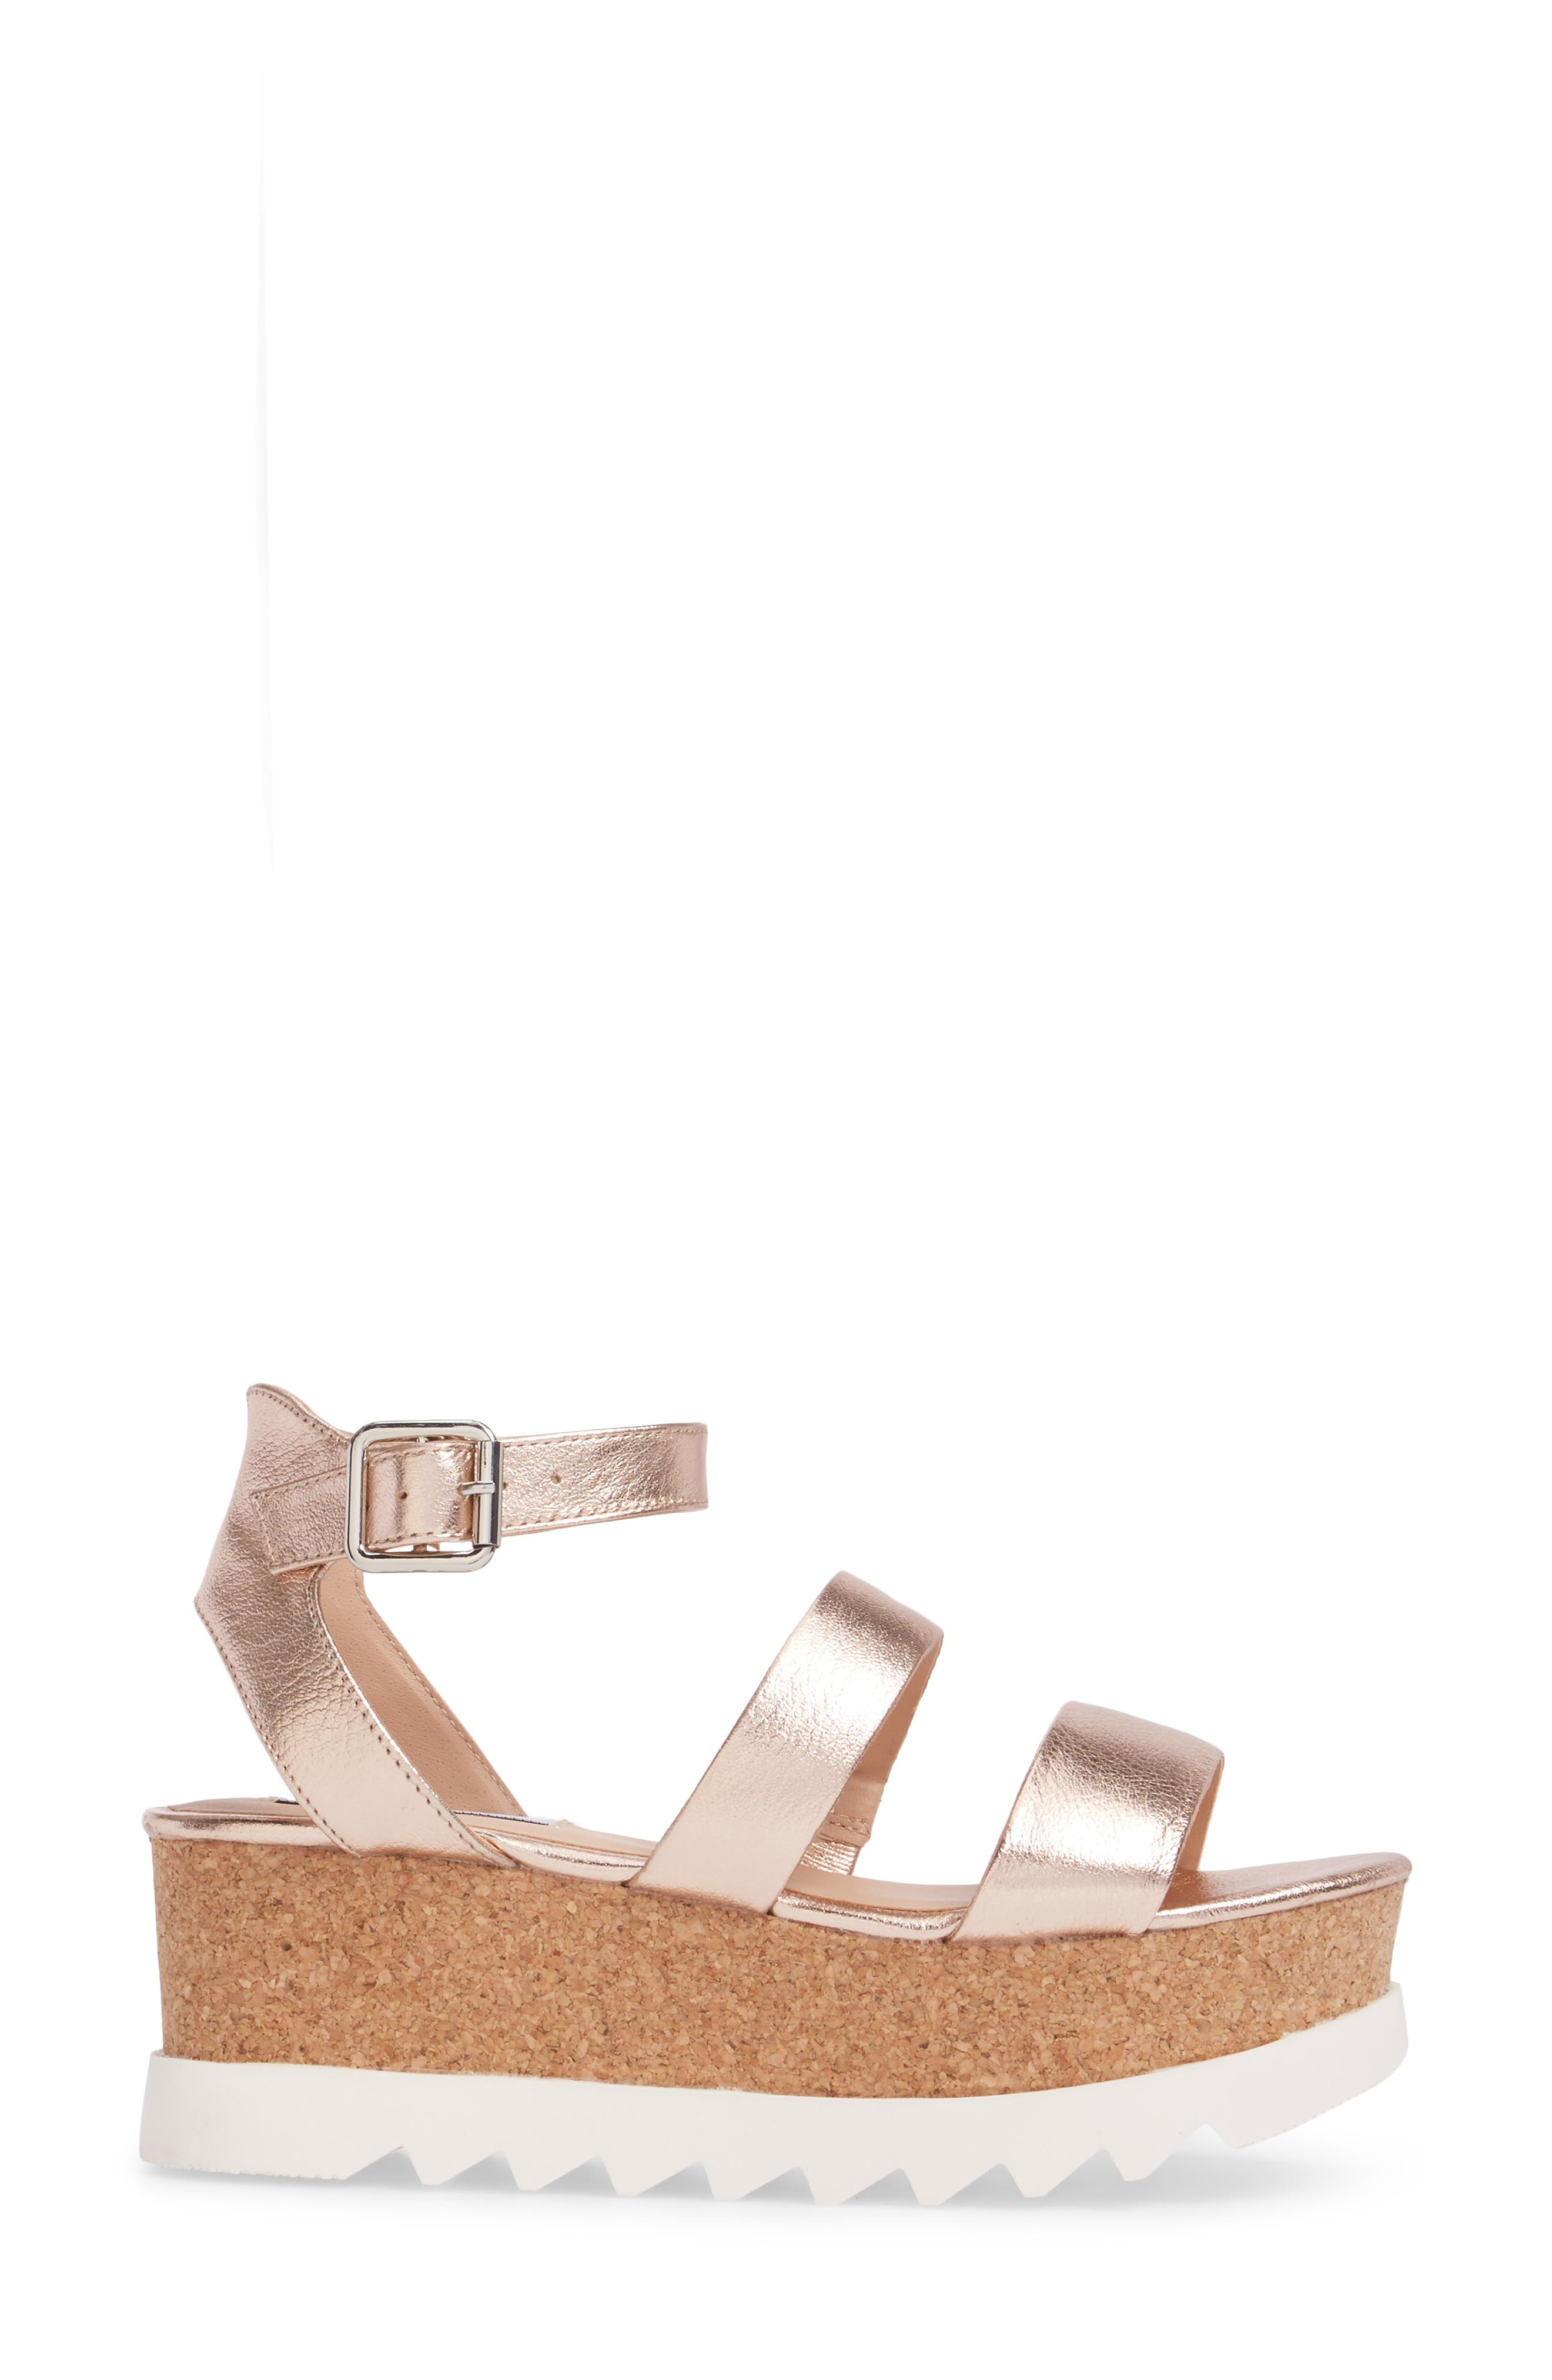 Kirsten Layered Platform Sandal,                             Alternate thumbnail 3, color,                             Rose Leather